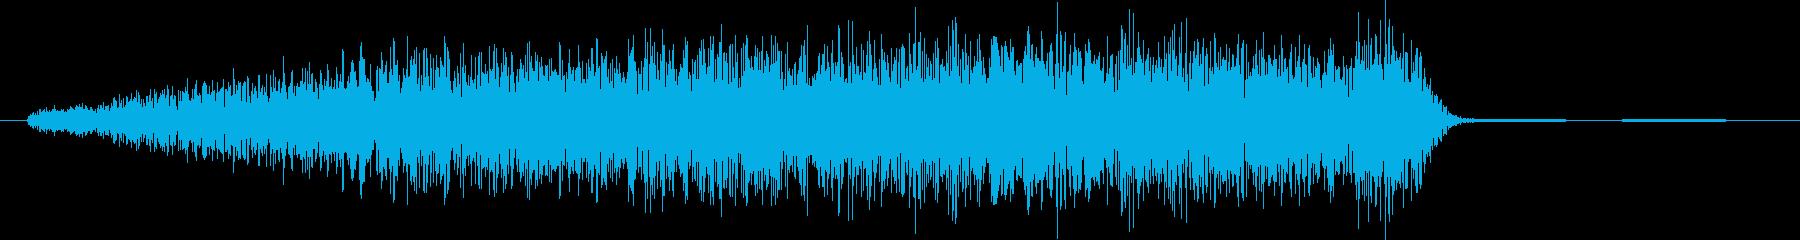 SE 高音ノイズ ギューンの再生済みの波形